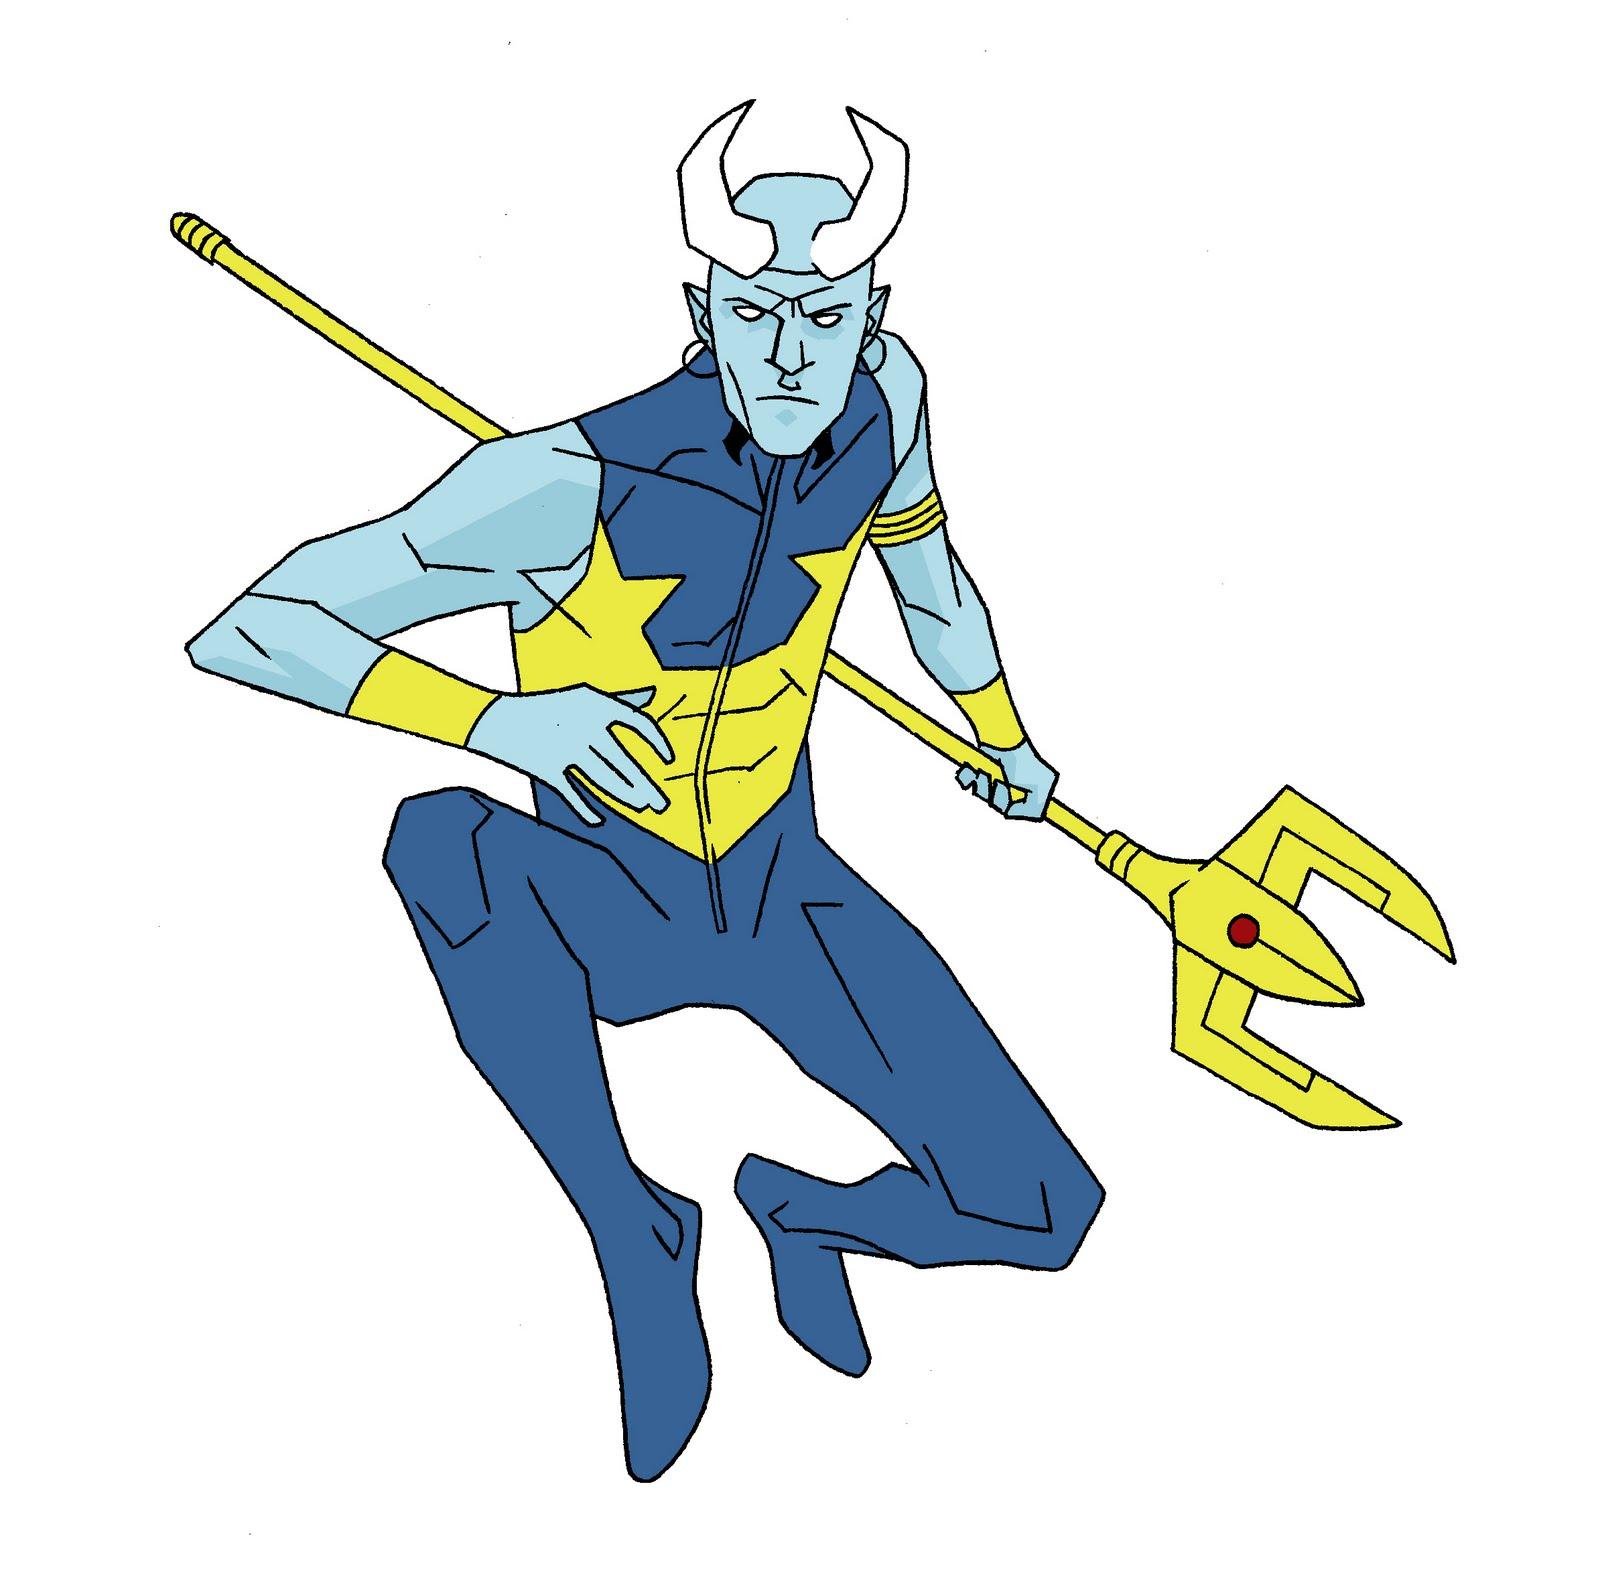 dcu Blue Devil concept wip b by Needham-Comics on DeviantArt